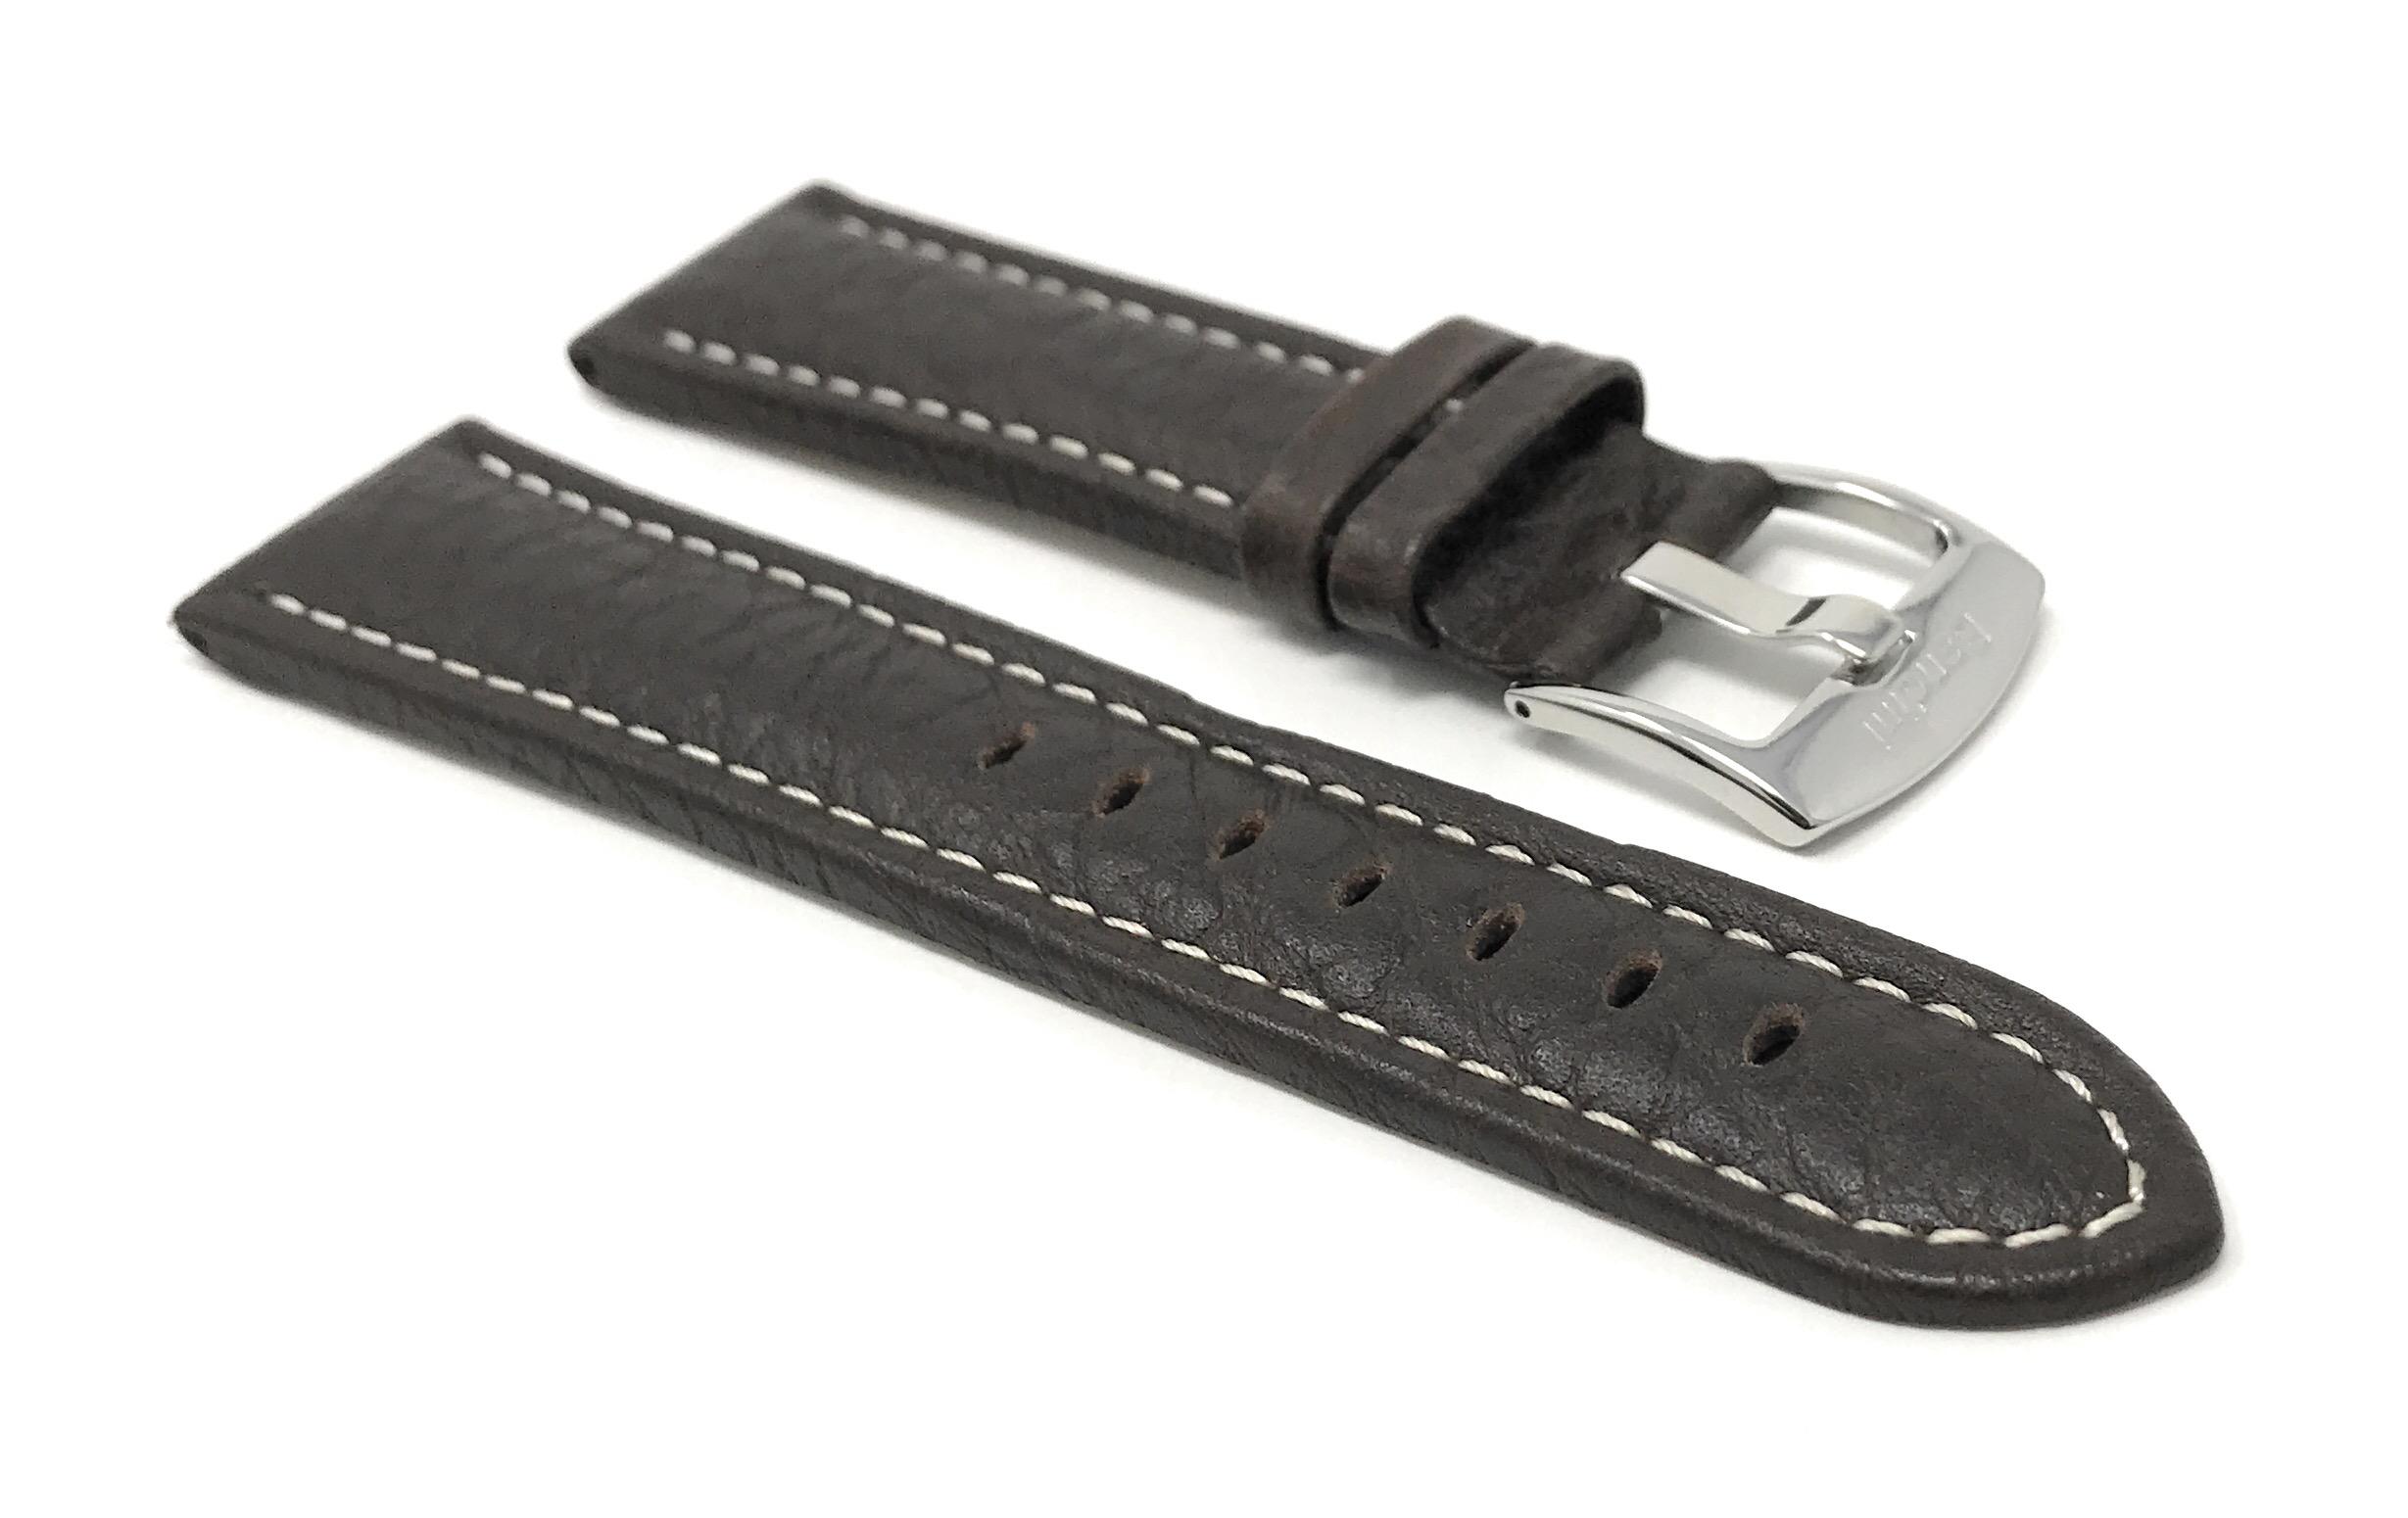 Bandini-Watch-Band-Leather-Strap-Buffalo-Pattern-18mm-30mm-Extra-Long-Also thumbnail 27